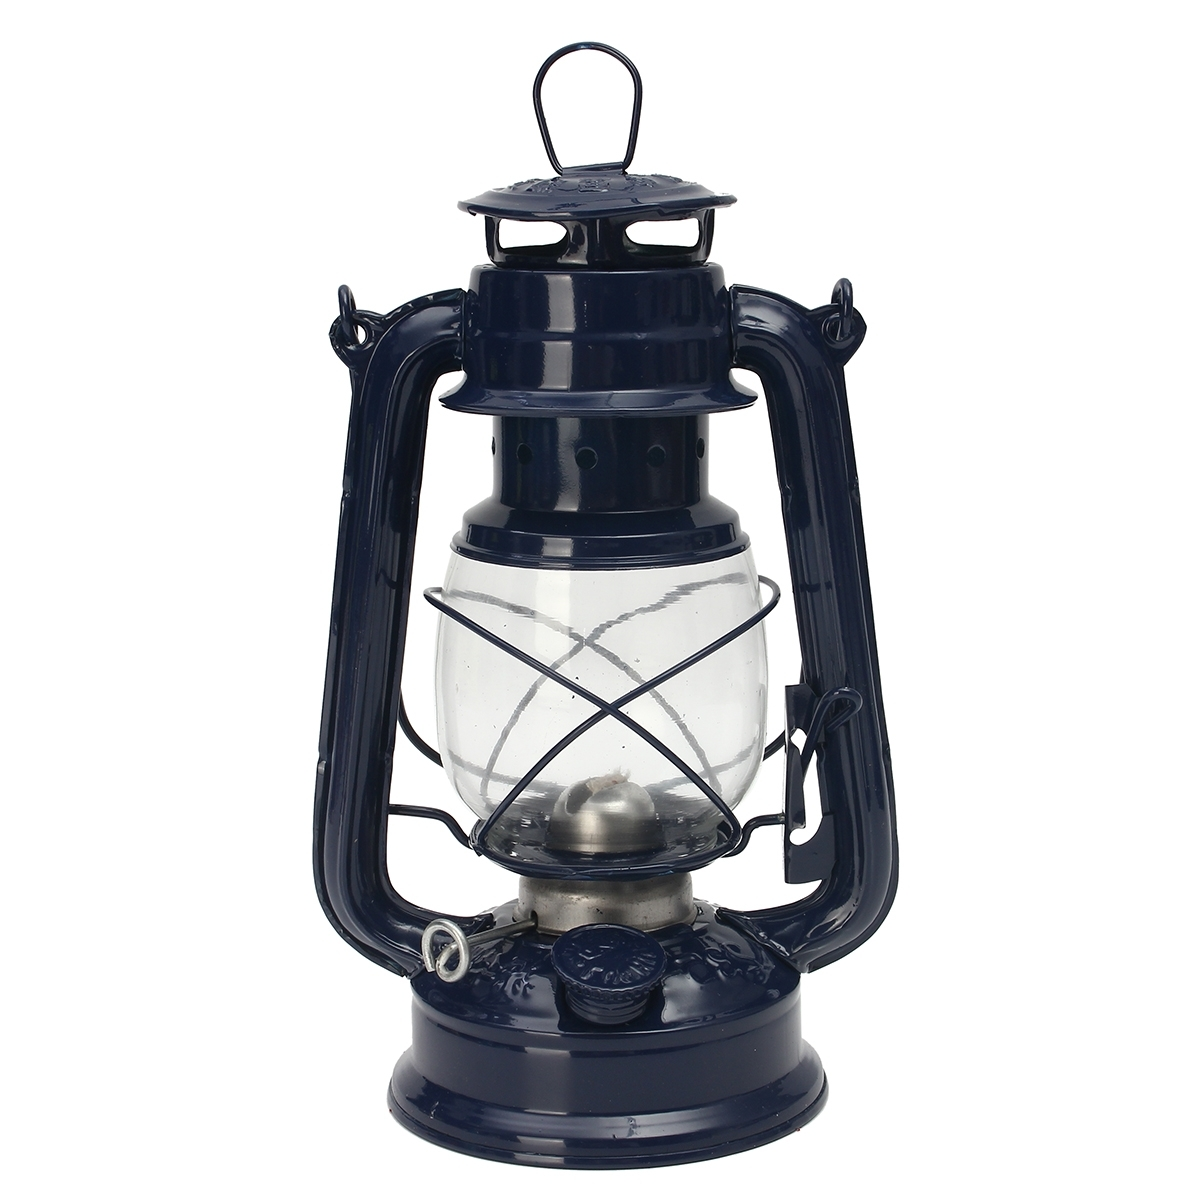 Retro Oil Lantern Garden Outdoor Camp Kerosene Paraffin Hurricane With Regard To Most Popular Outdoor Kerosene Lanterns (View 10 of 20)